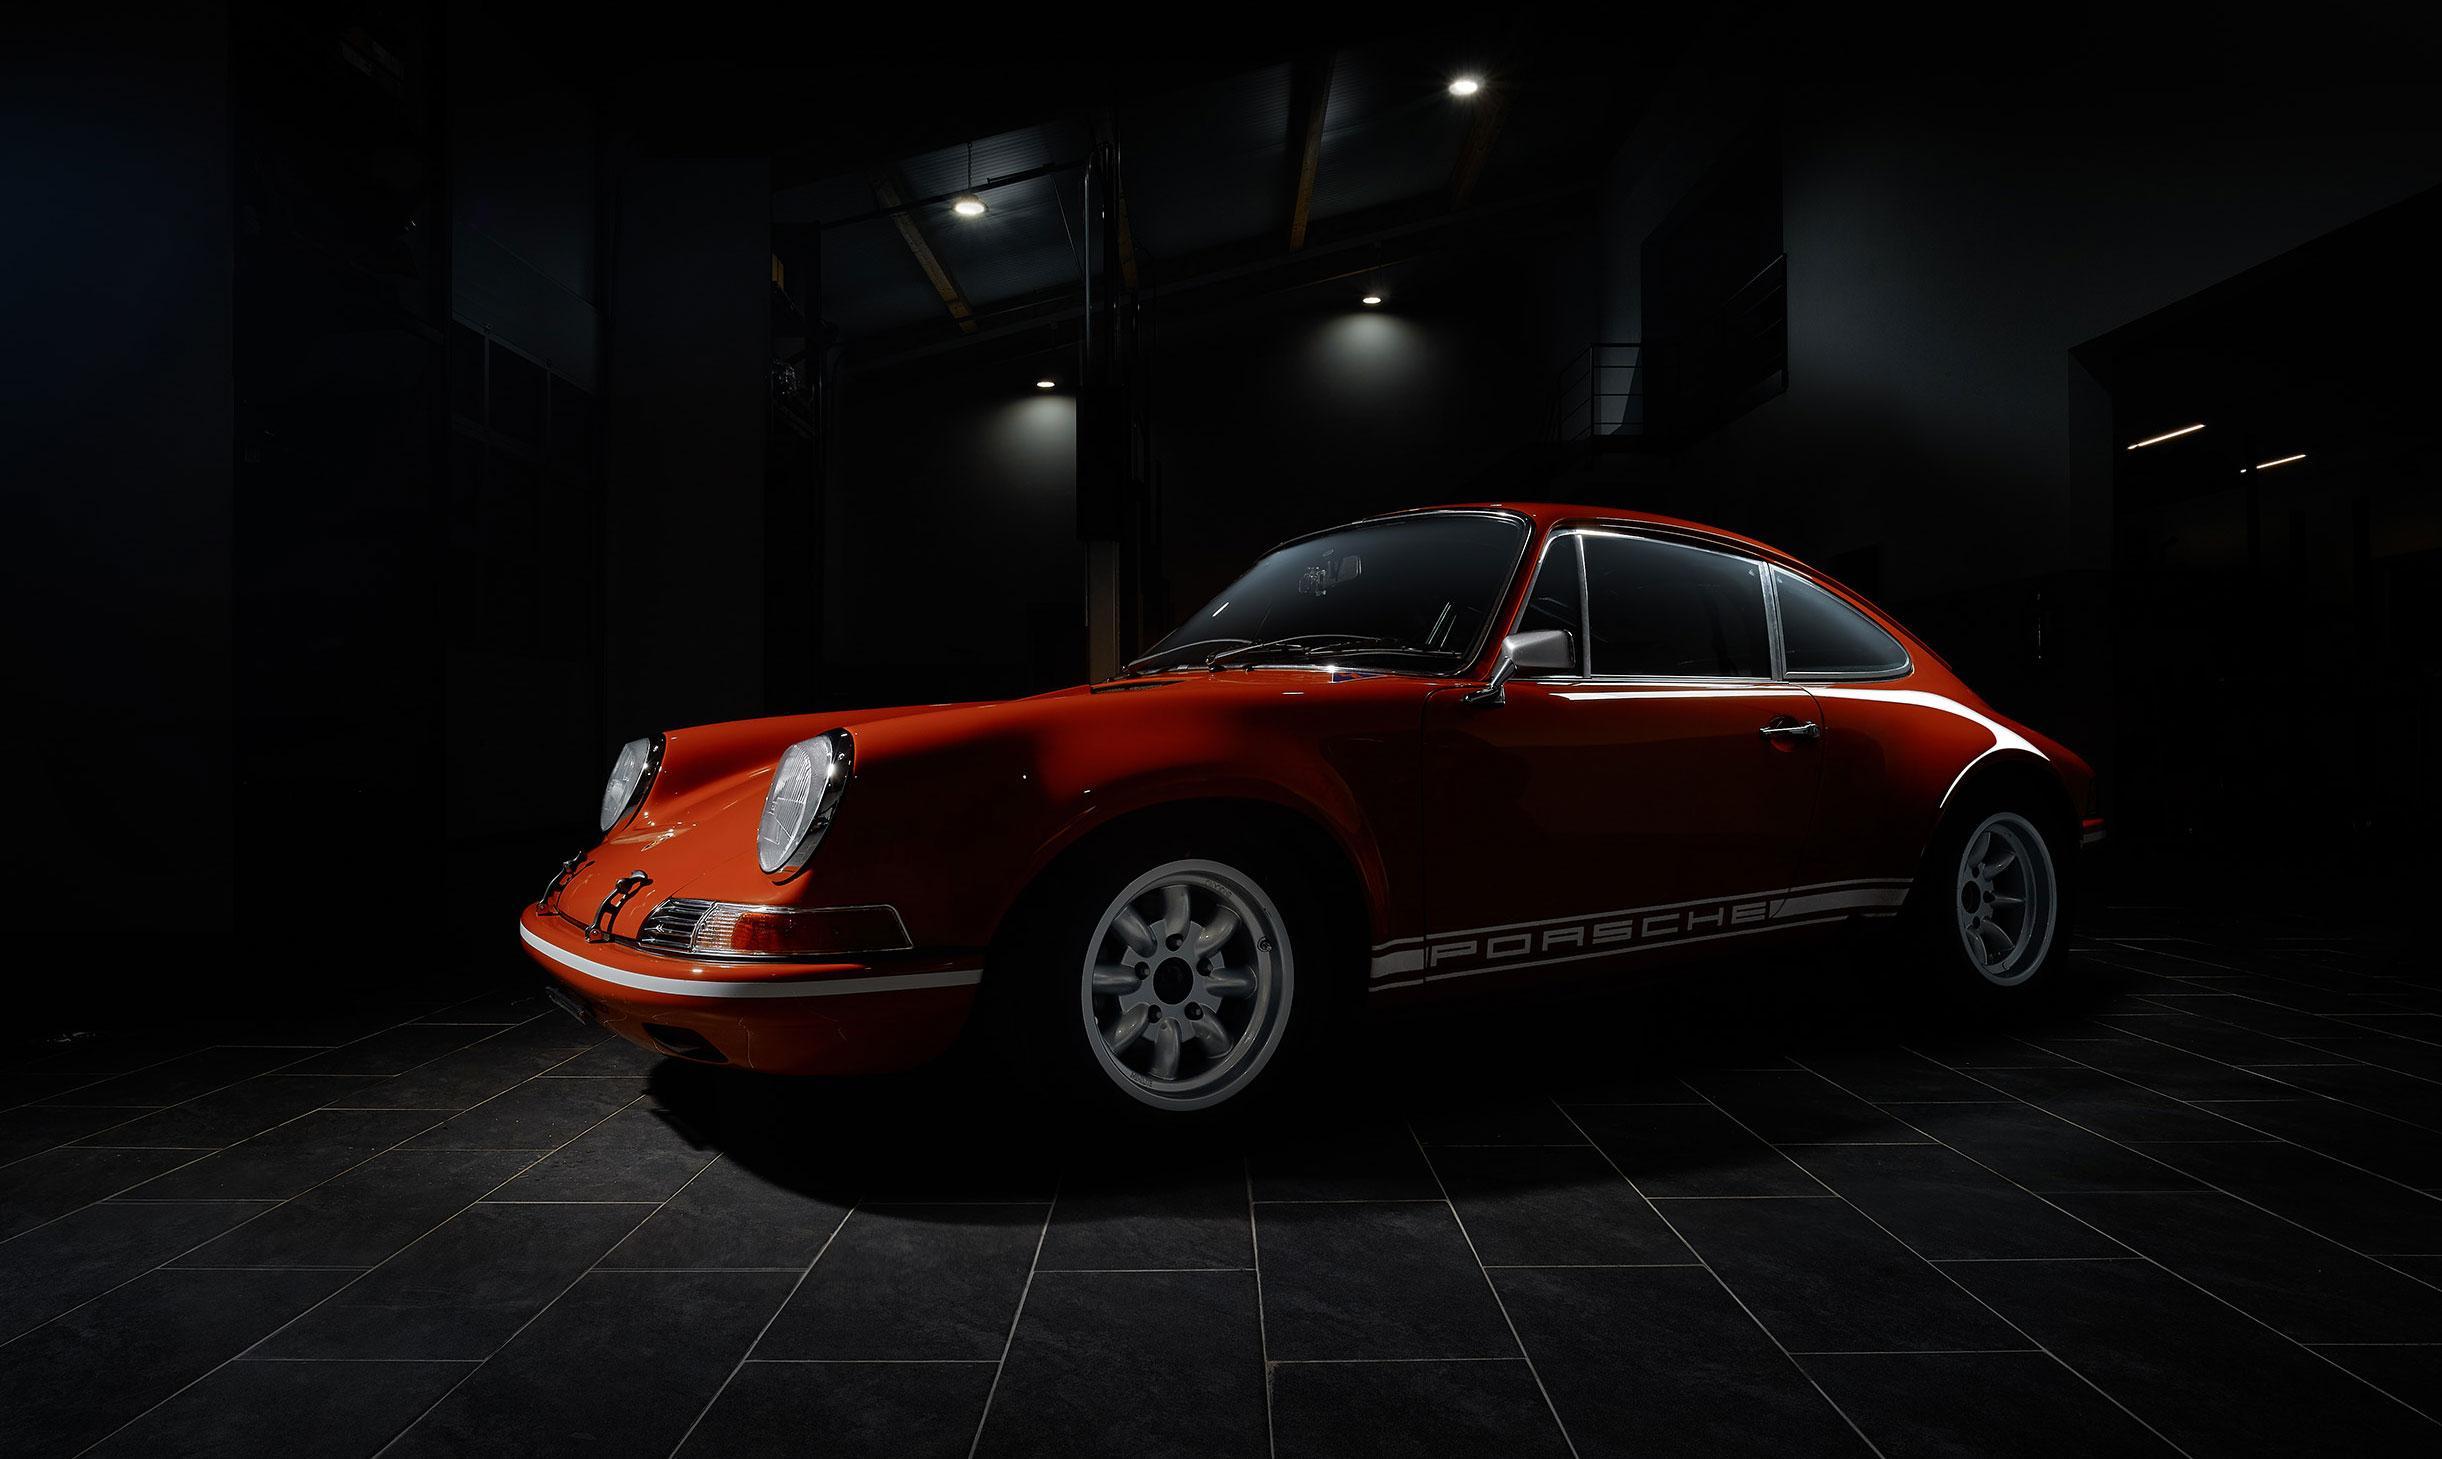 Paintmayer Motorenmanufaktur Slider Porsche